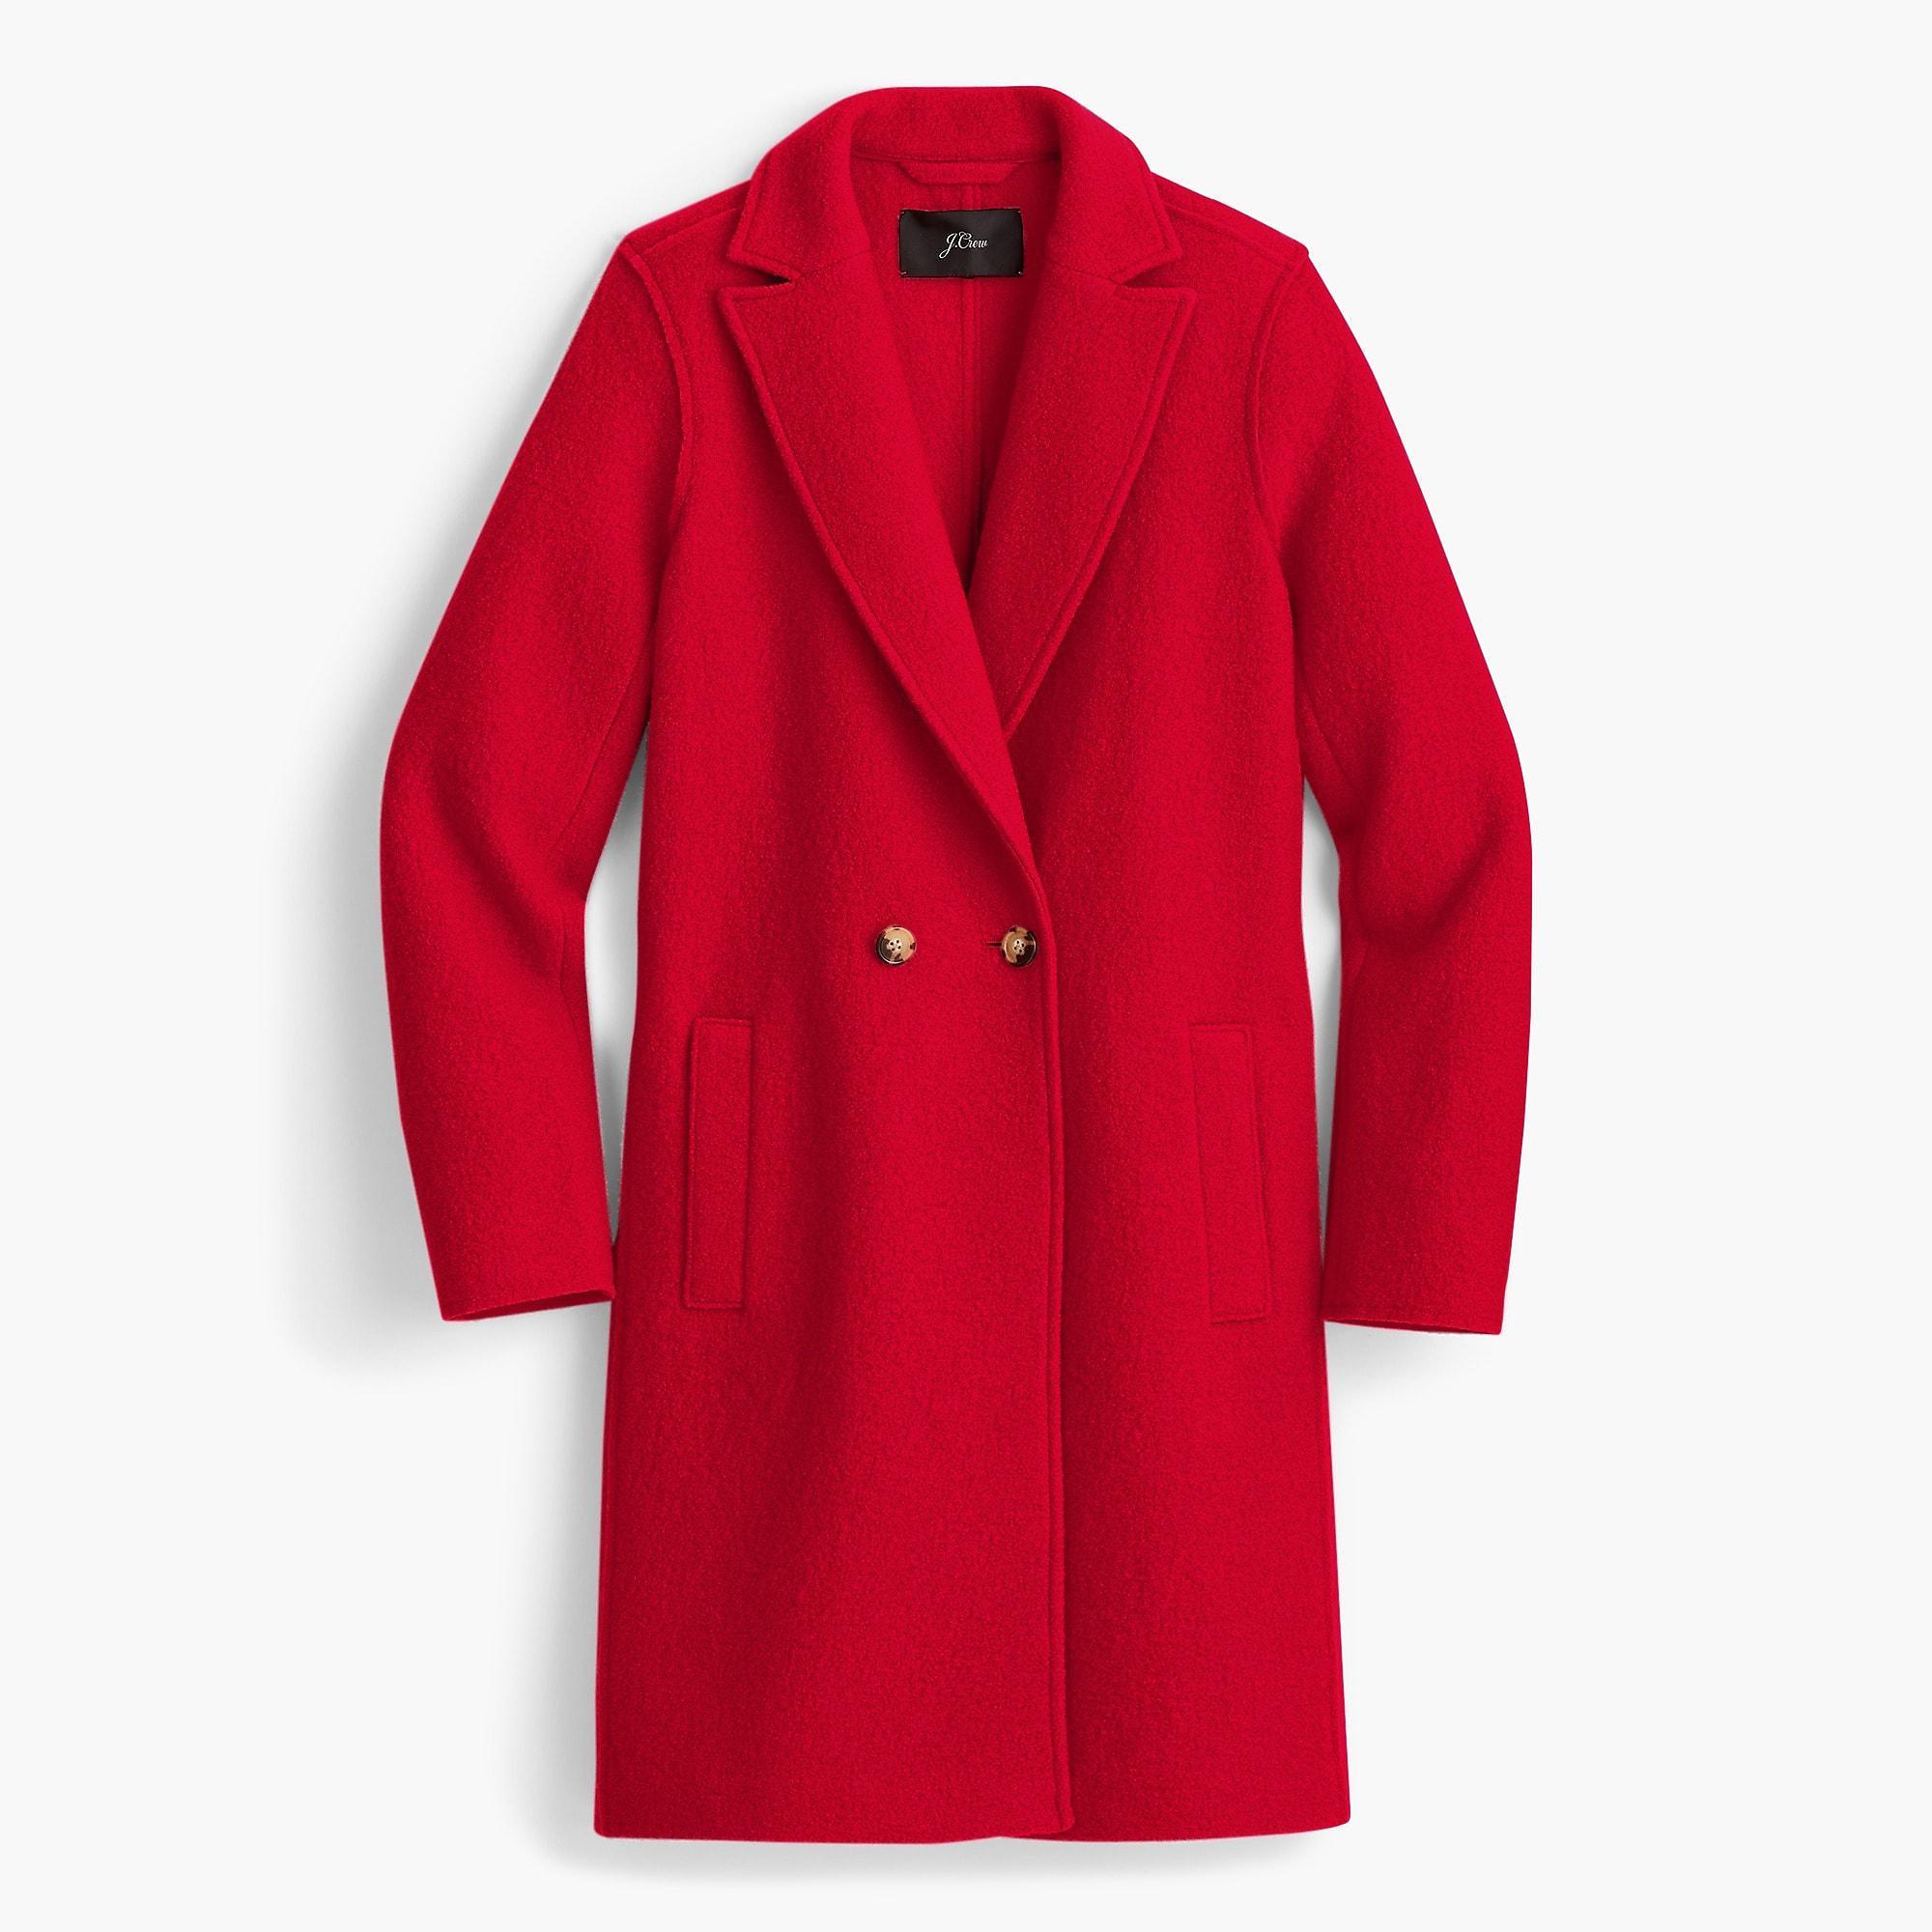 3b319efc8a8b6 Lyst - J.Crew Daphne Topcoat In Italian Boiled Wool in Red